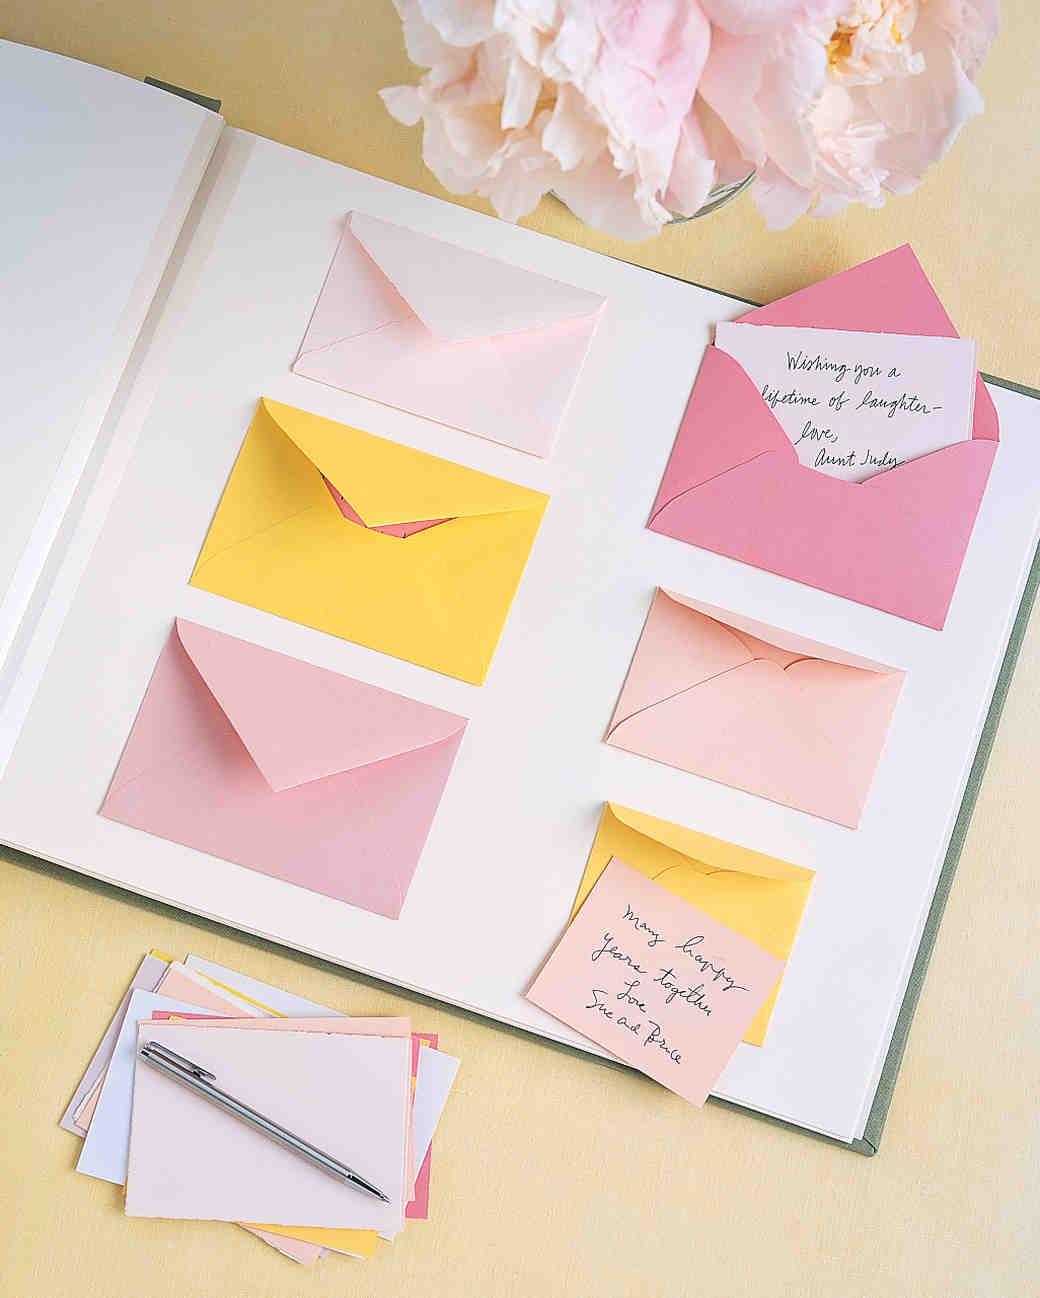 Diy wedding guest book ideas solutioingenieria Images